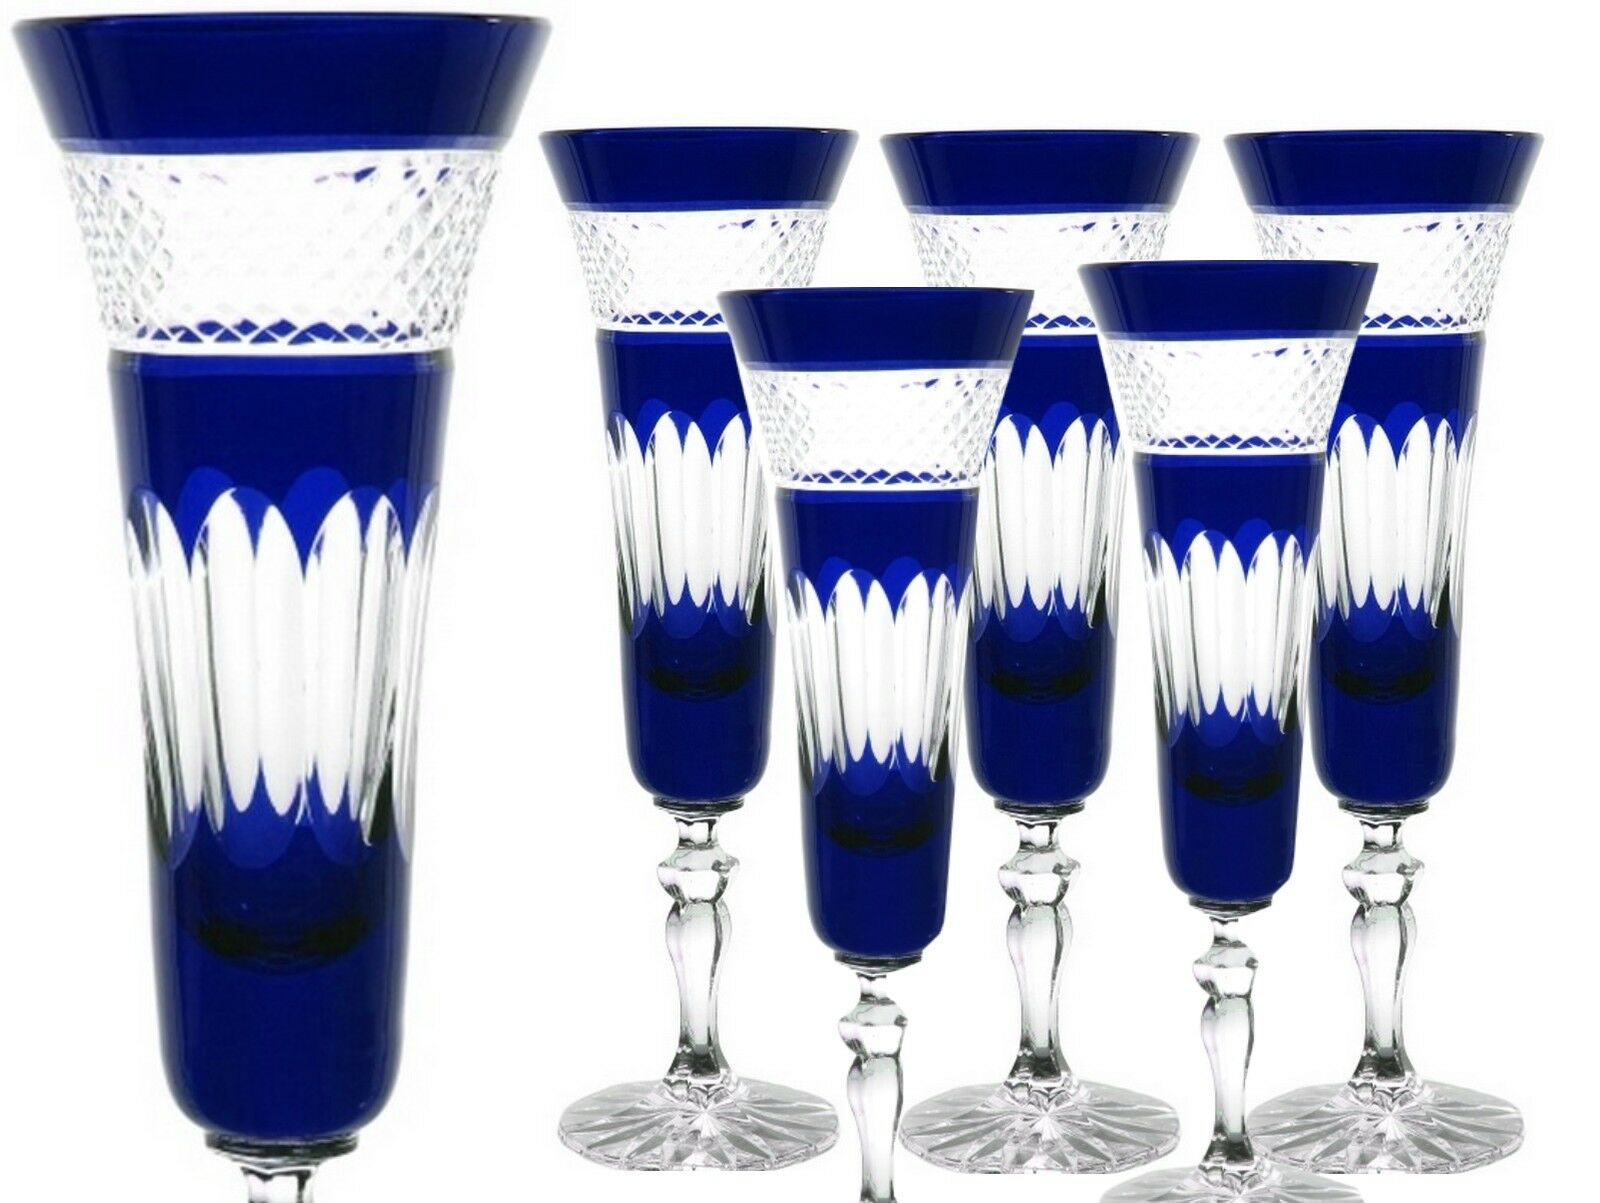 Bleikristall romains à champagne 6 ST (443obg-b) Bleu furent. CRISTAL à champagne